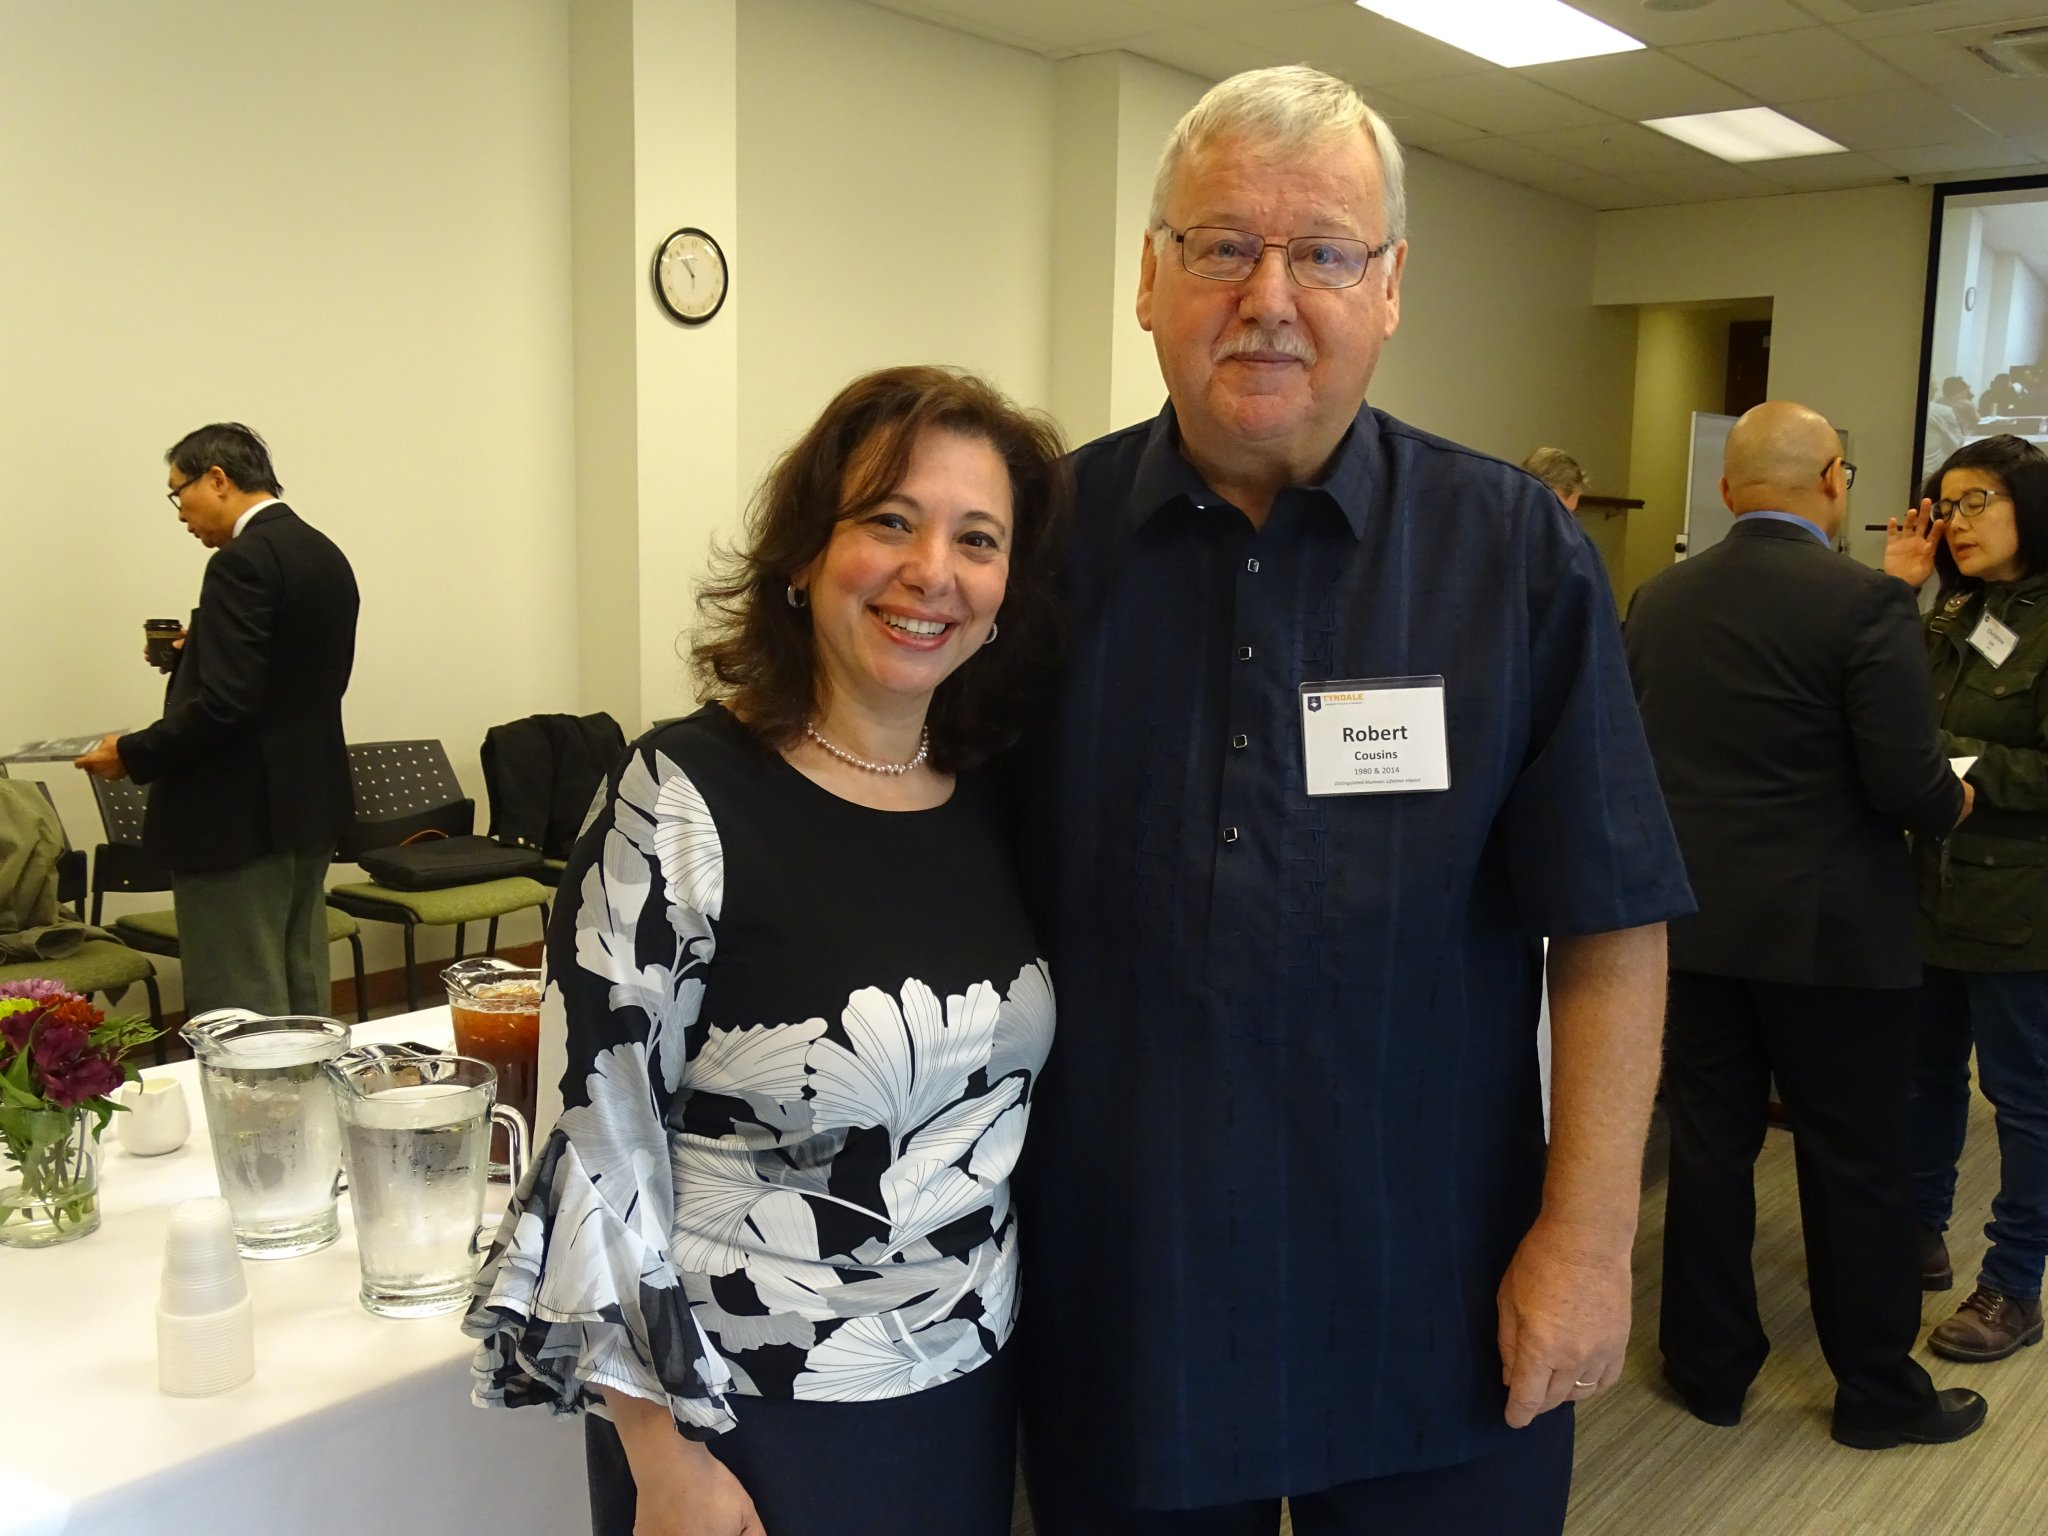 Dr. Robert Cousins at TIM Centre Celebration